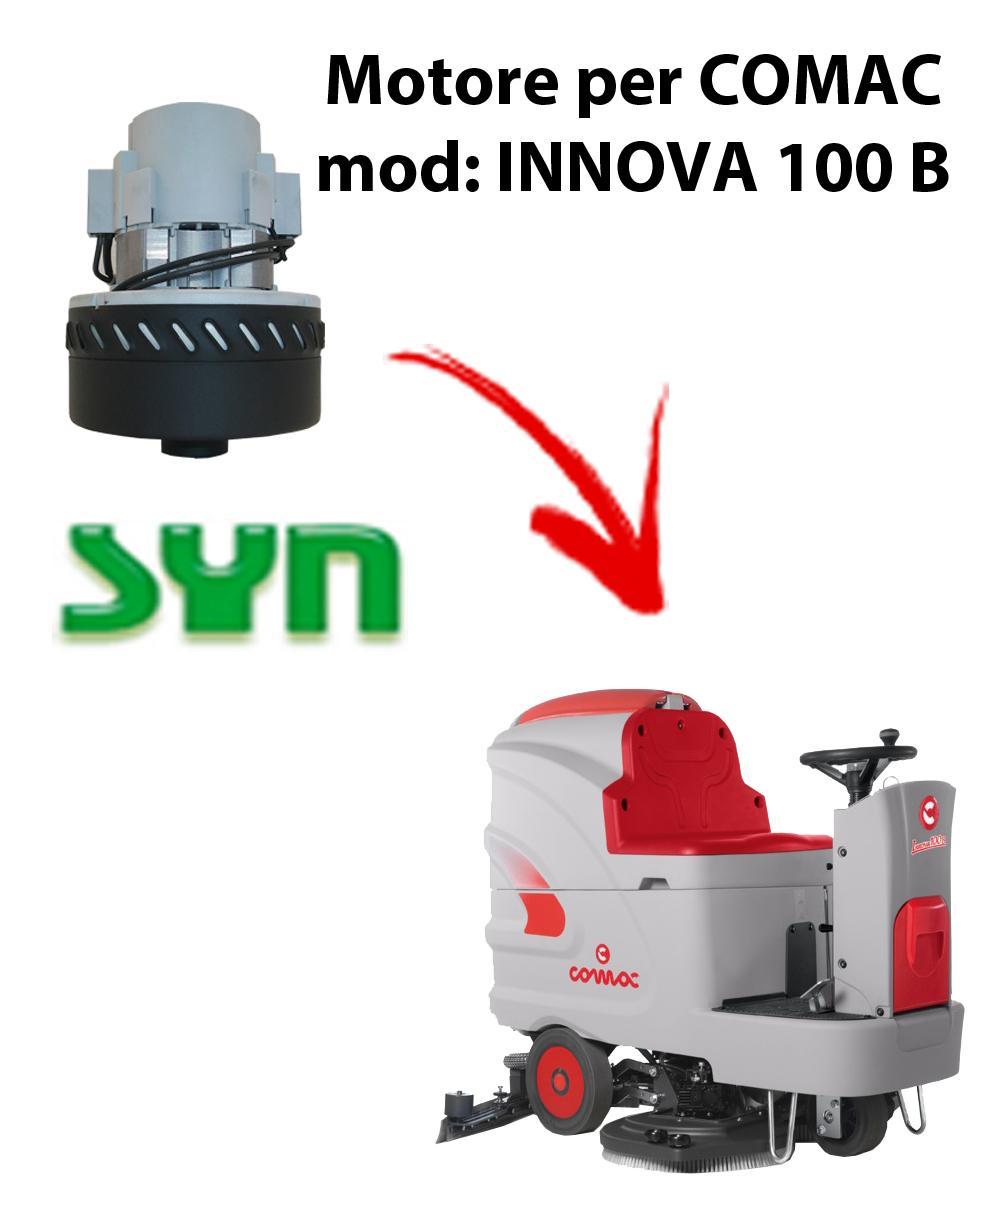 INNOVA 100 B Motore aspirazione SYN per lavapavimenti Comac